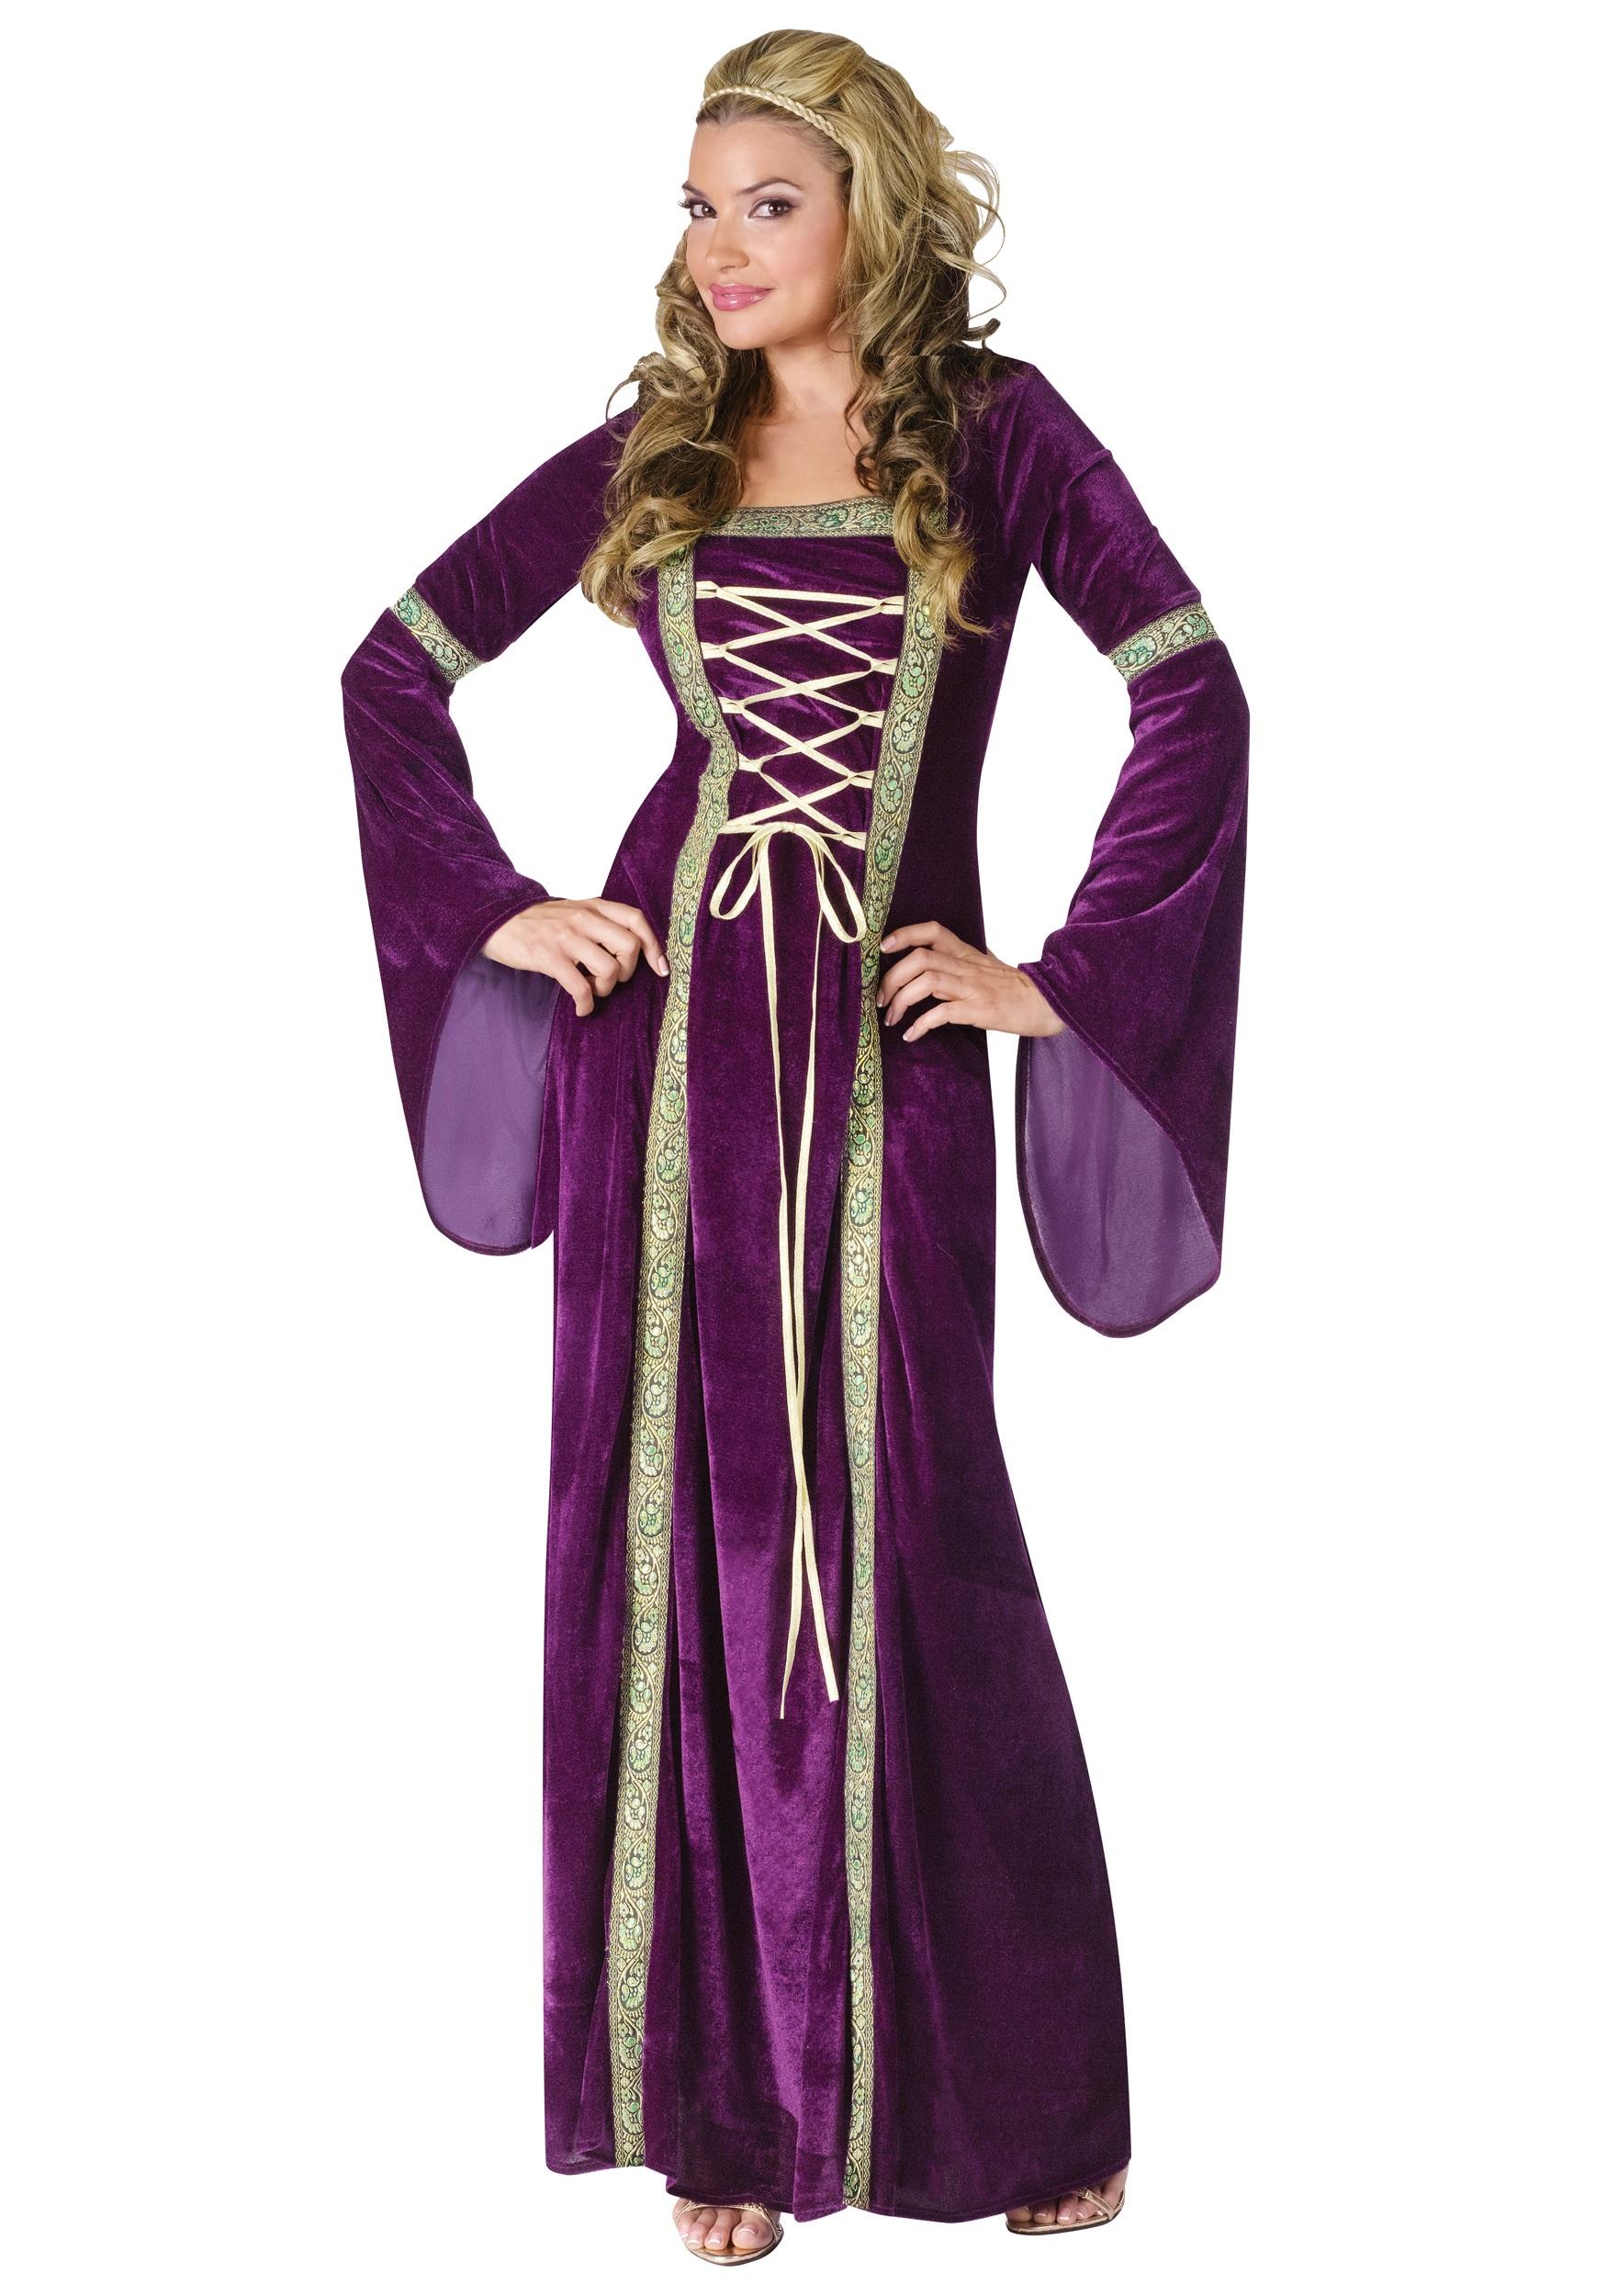 Renaissance Faire Costumes \u0026 Medieval Clothing - HalloweenCostumes.com